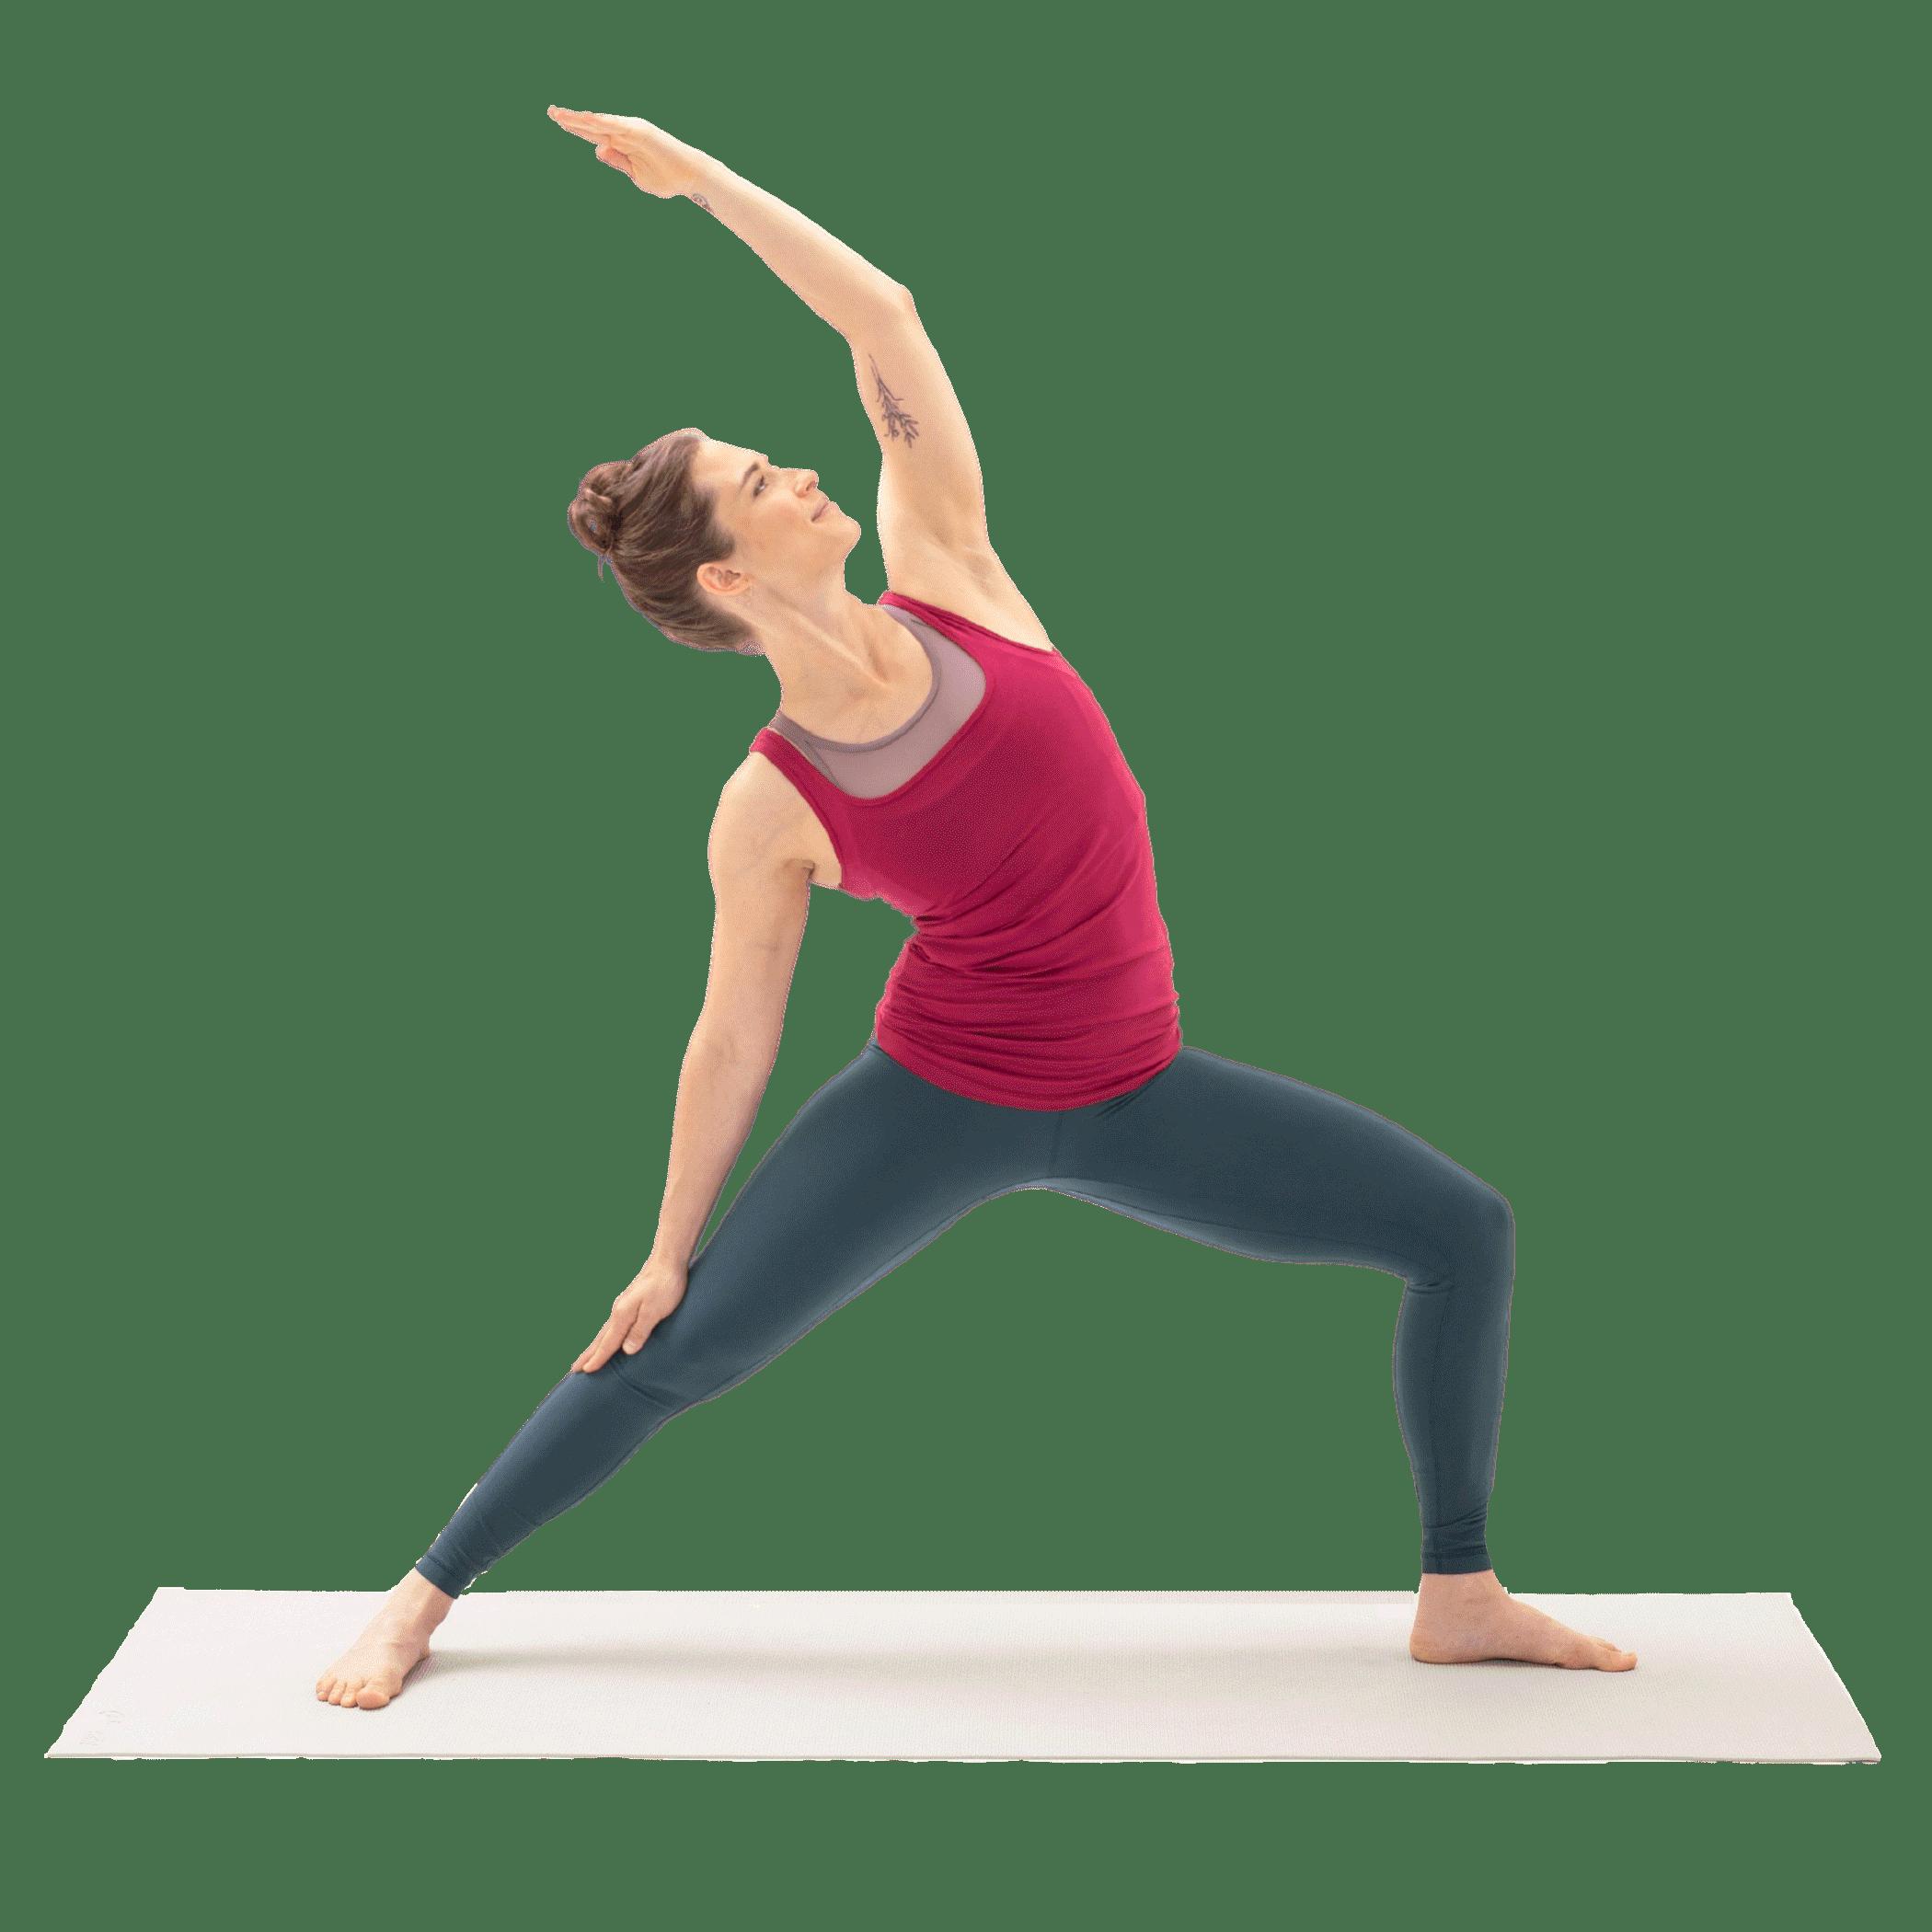 yoga pant, Active pants, Shoulder, camisoles, Leg, Undershirt, Neck, Sleeve, Knee, Waist